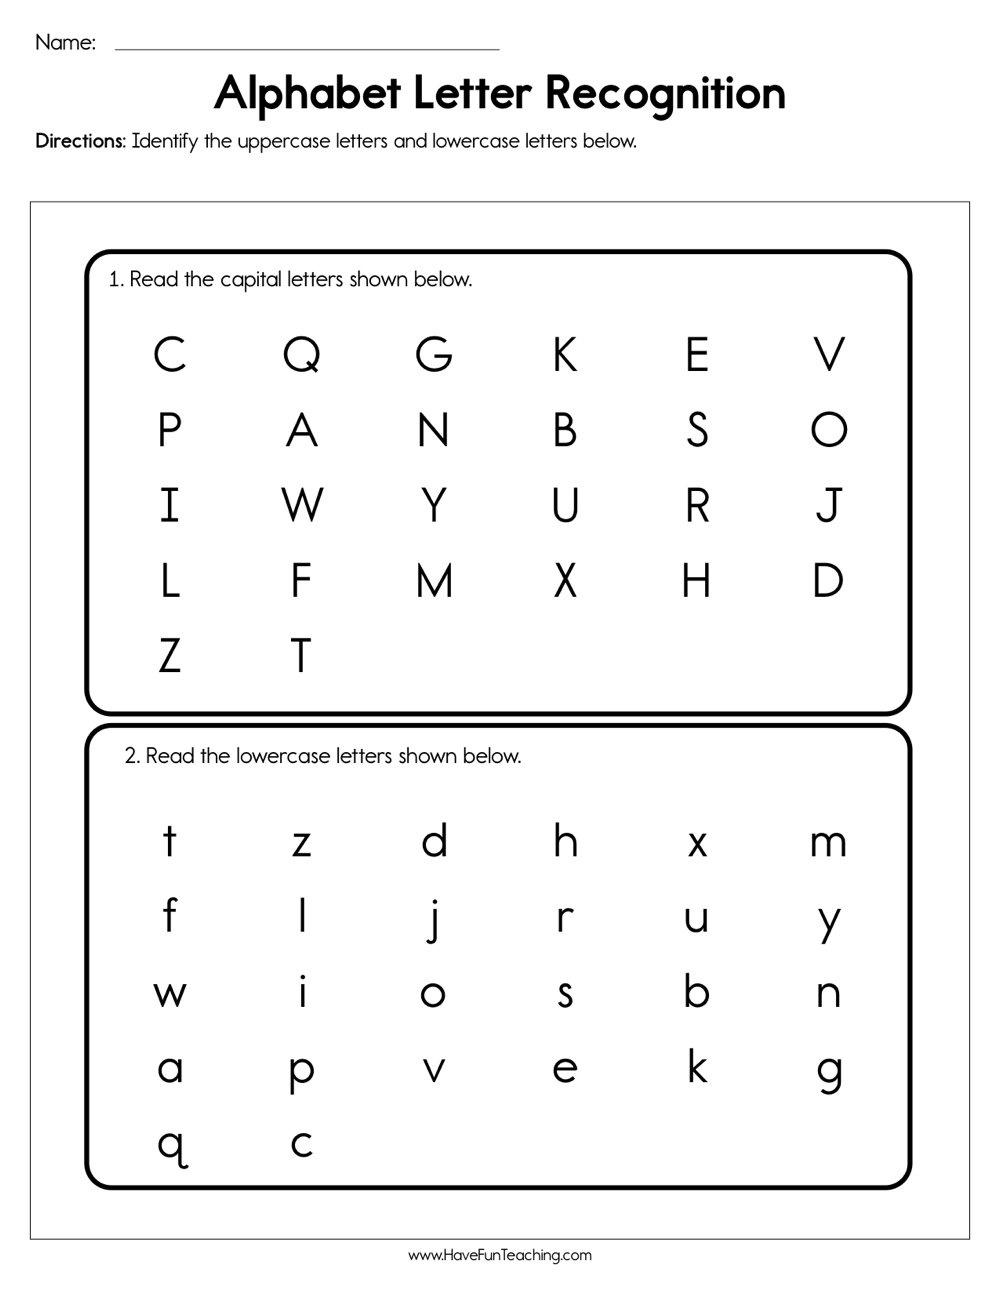 Resources | Phonics | Worksheets - Free Printable Phonics Assessments